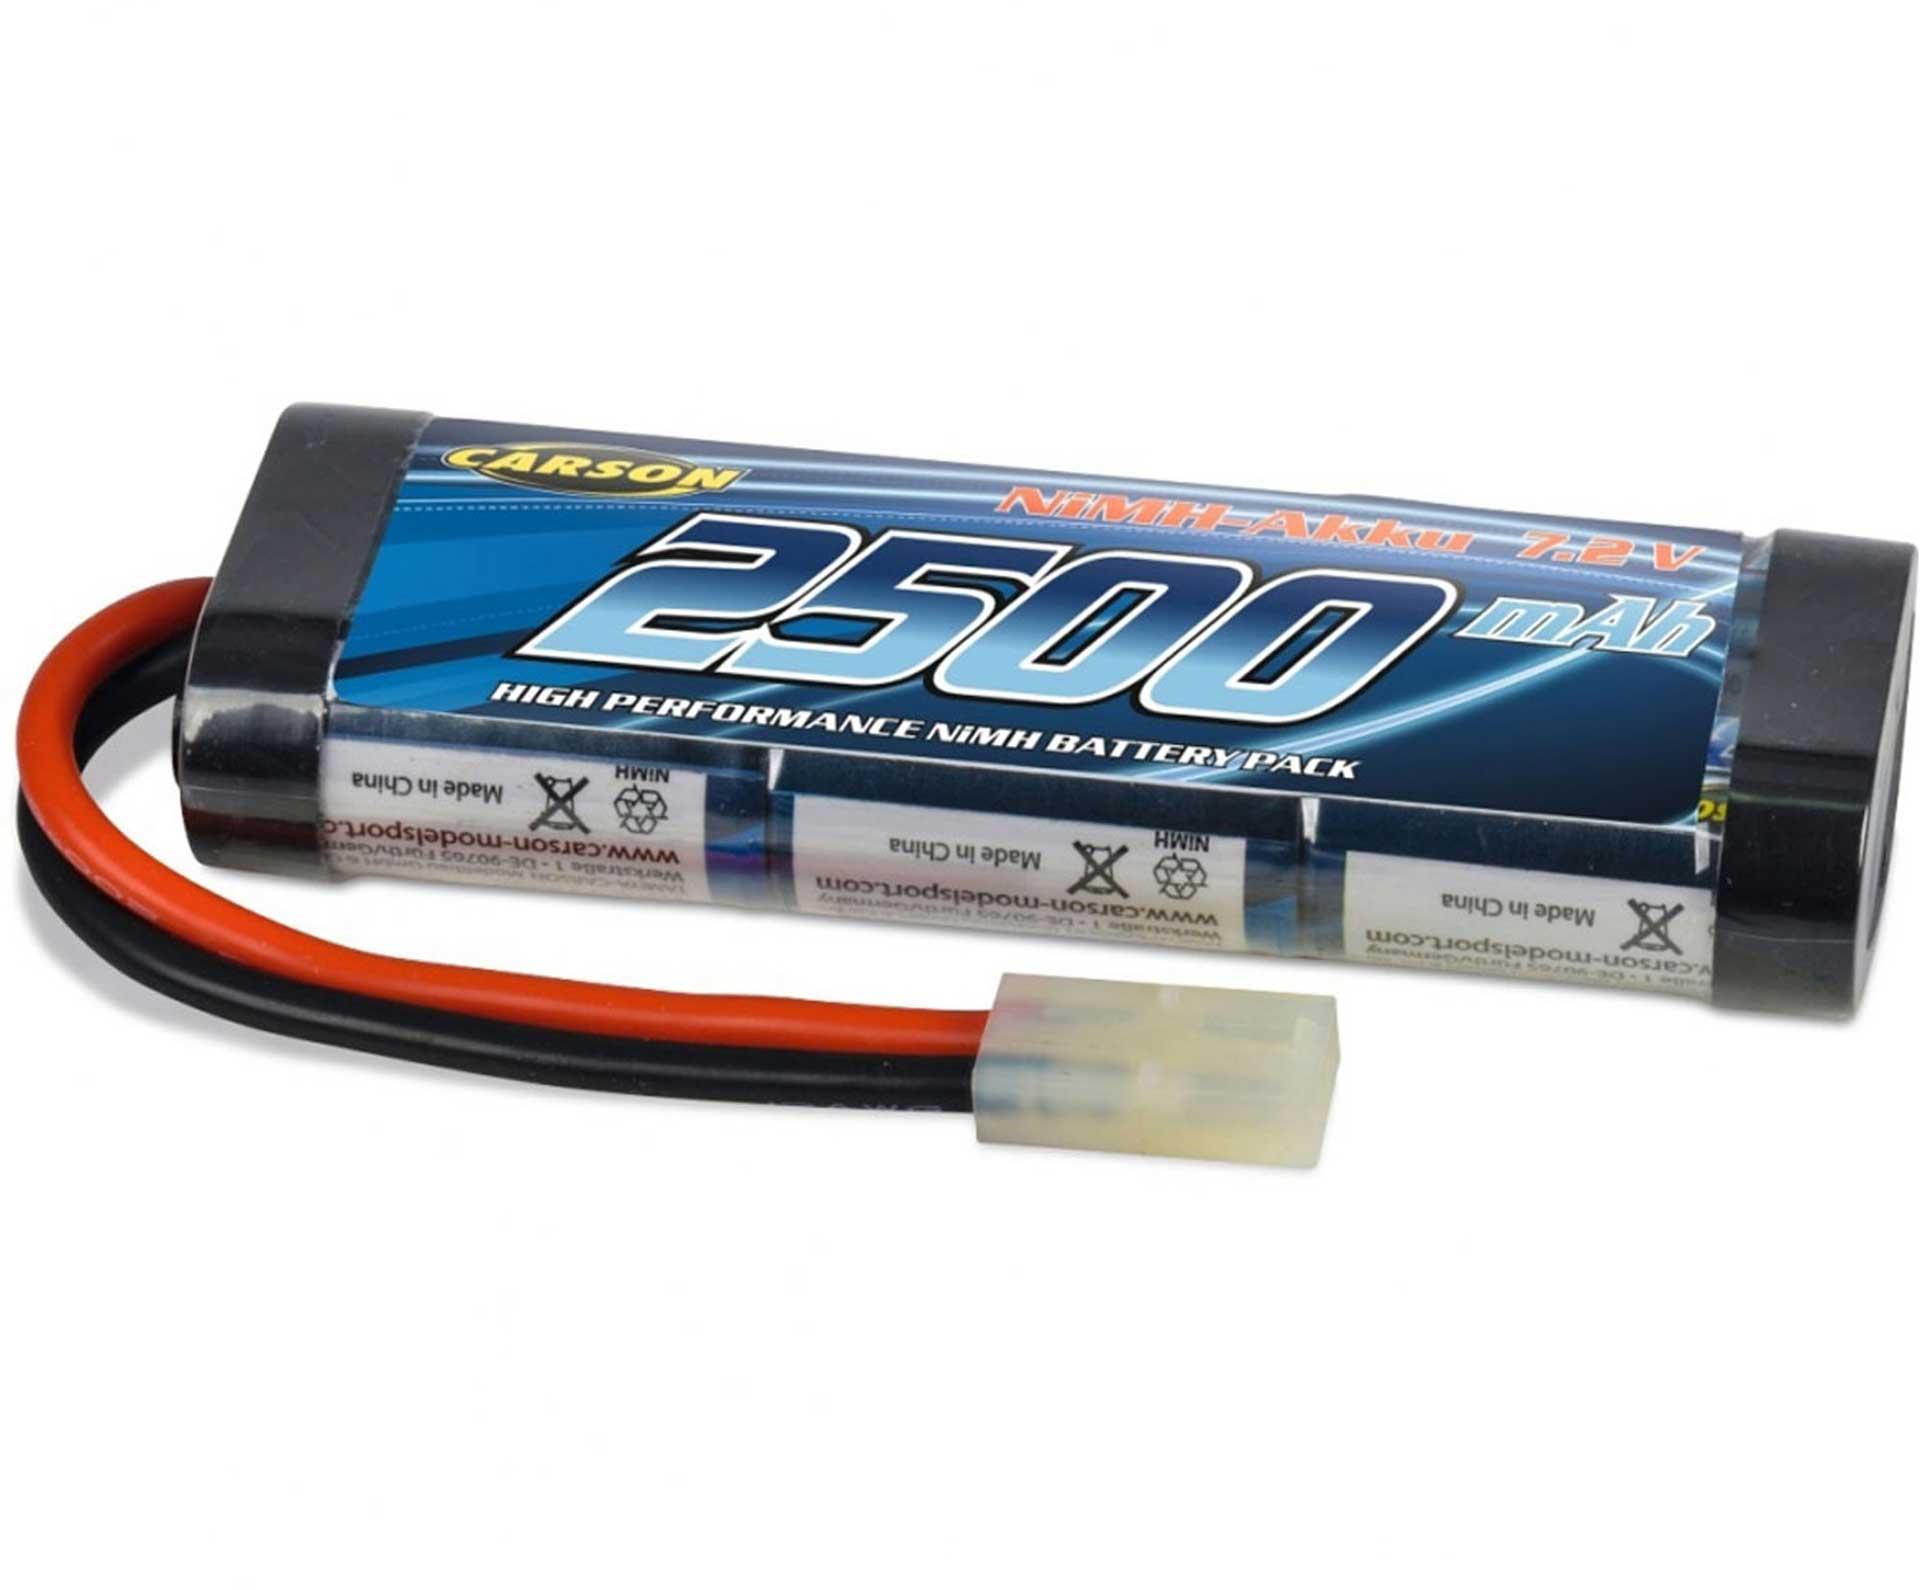 CARSON NI-MH RACING PACK 2500 MAH/7,2 VOLT